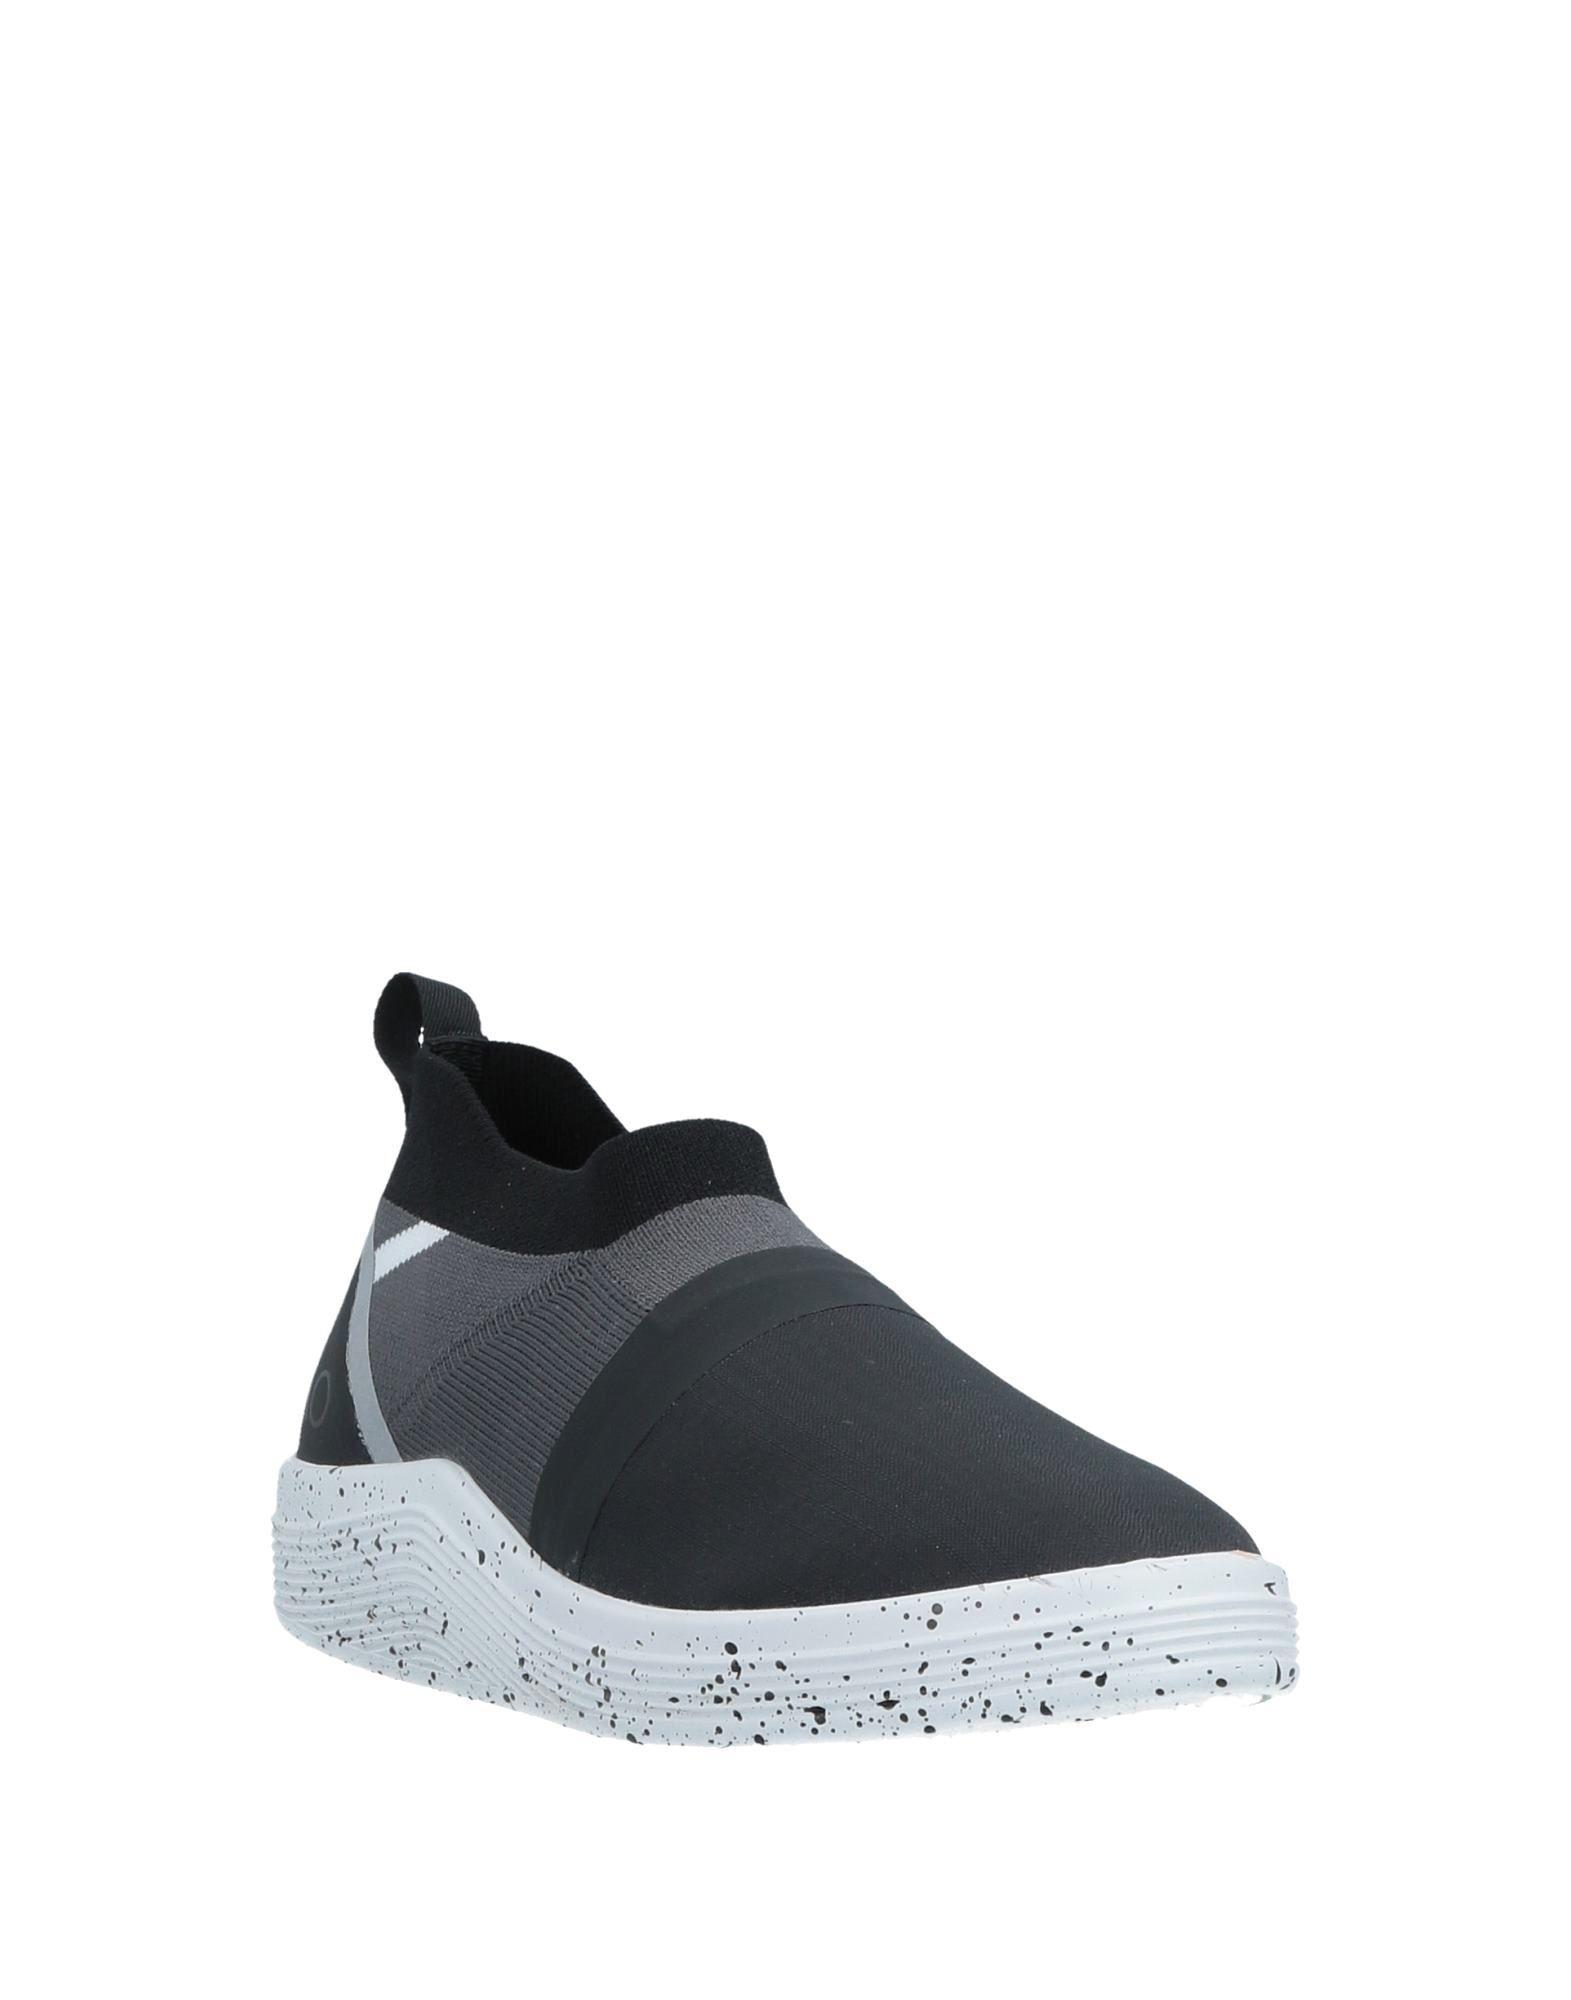 Adno® Gute Sneakers Damen  11522837VL Gute Adno® Qualität beliebte Schuhe 4f5690